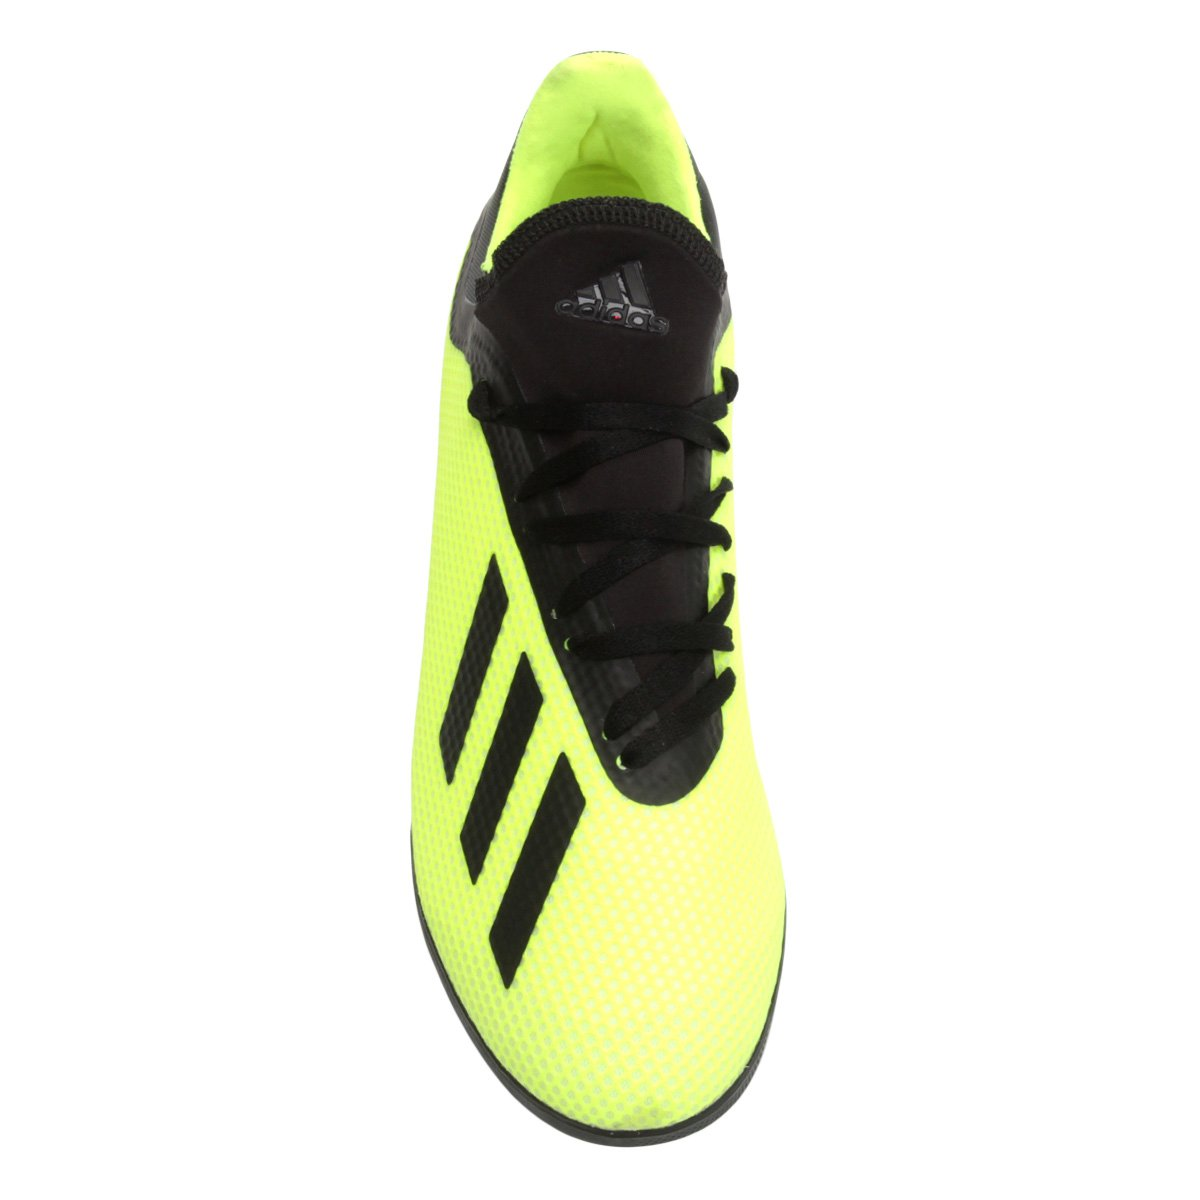 Chuteira Society Adidas X Tango 18 3 TF - Amarelo e Preto - Compre ... c2b20d62cab80